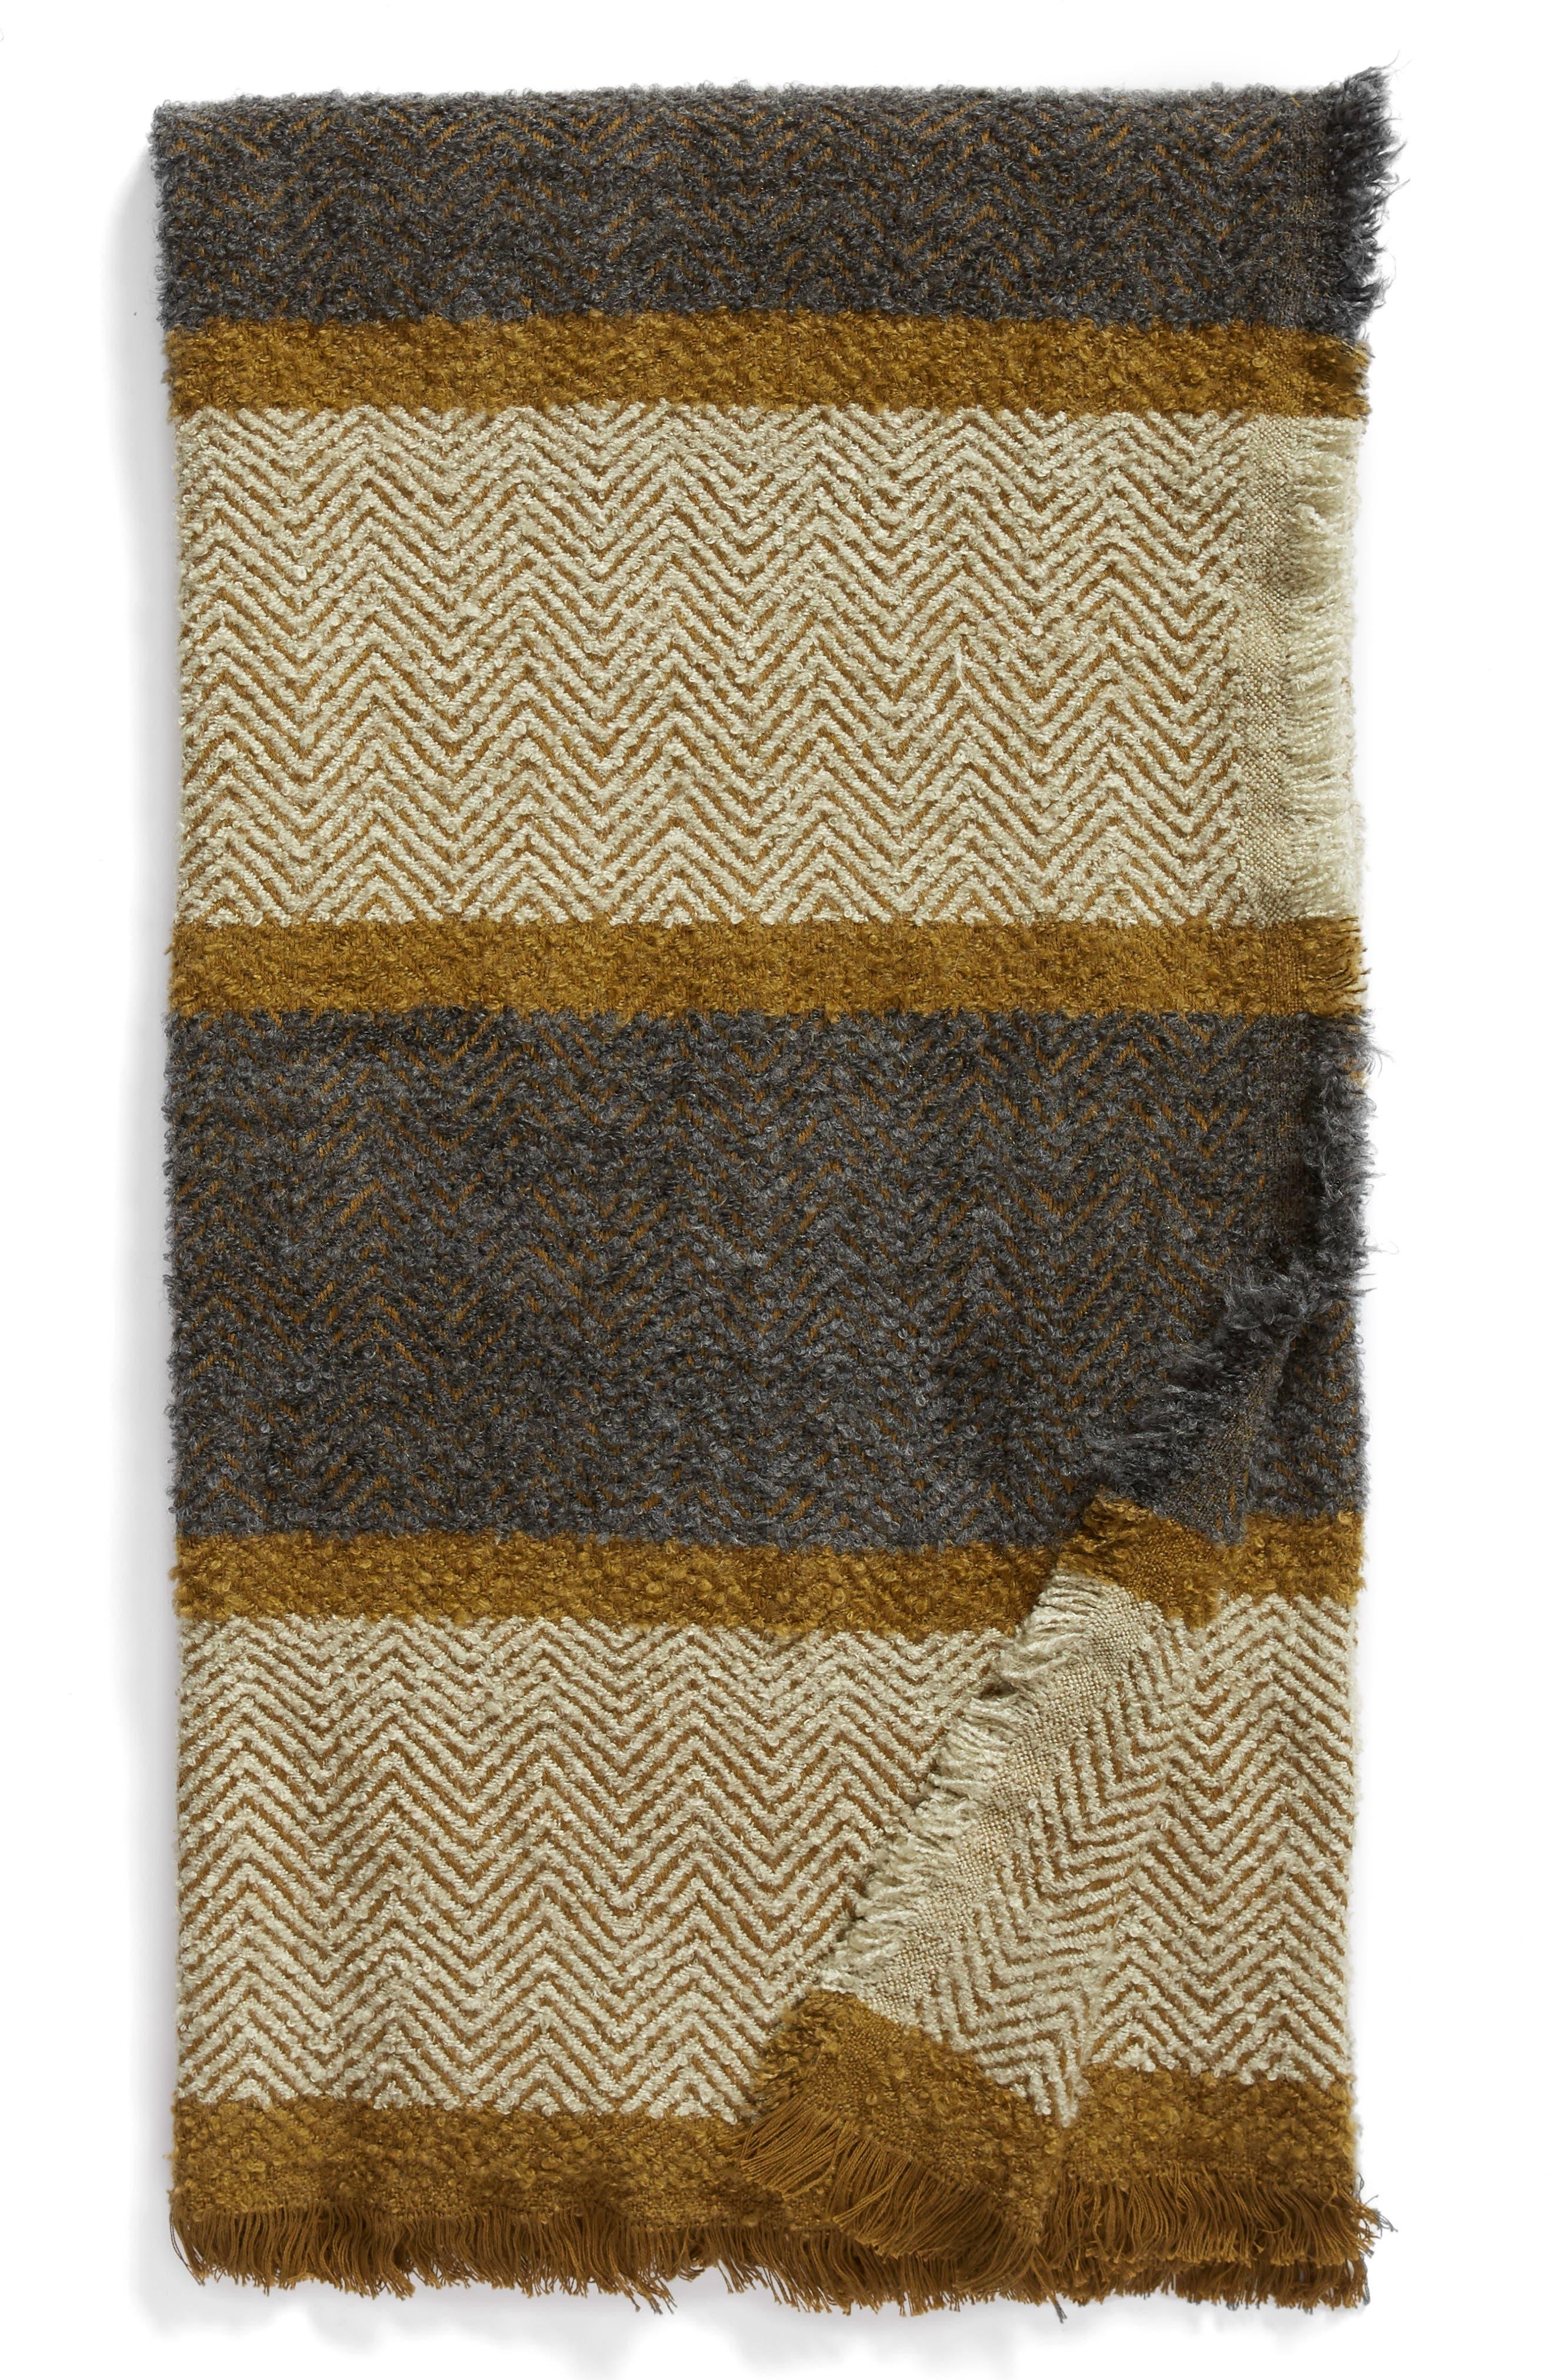 TREASURE & BOND, Herringbone Stripe Throw, Main thumbnail 1, color, GREY ONYX